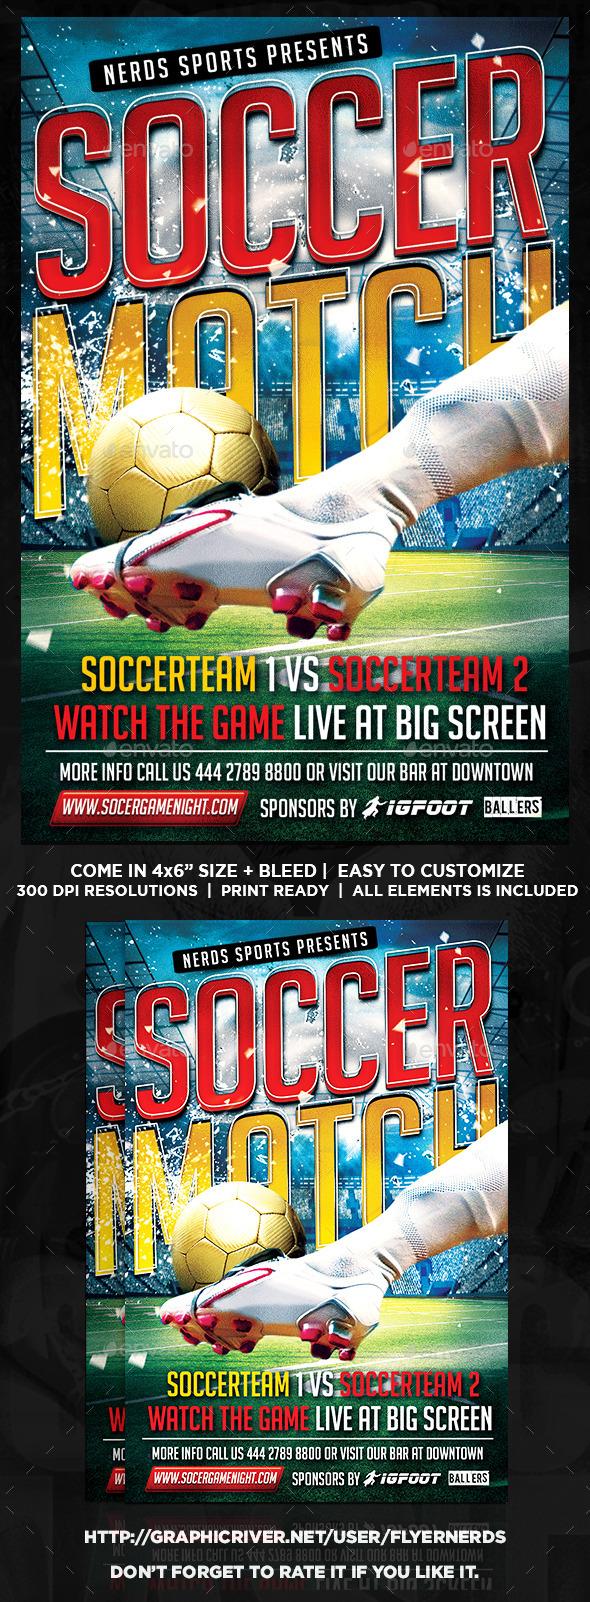 Soccer Match Flyer - Sports Events